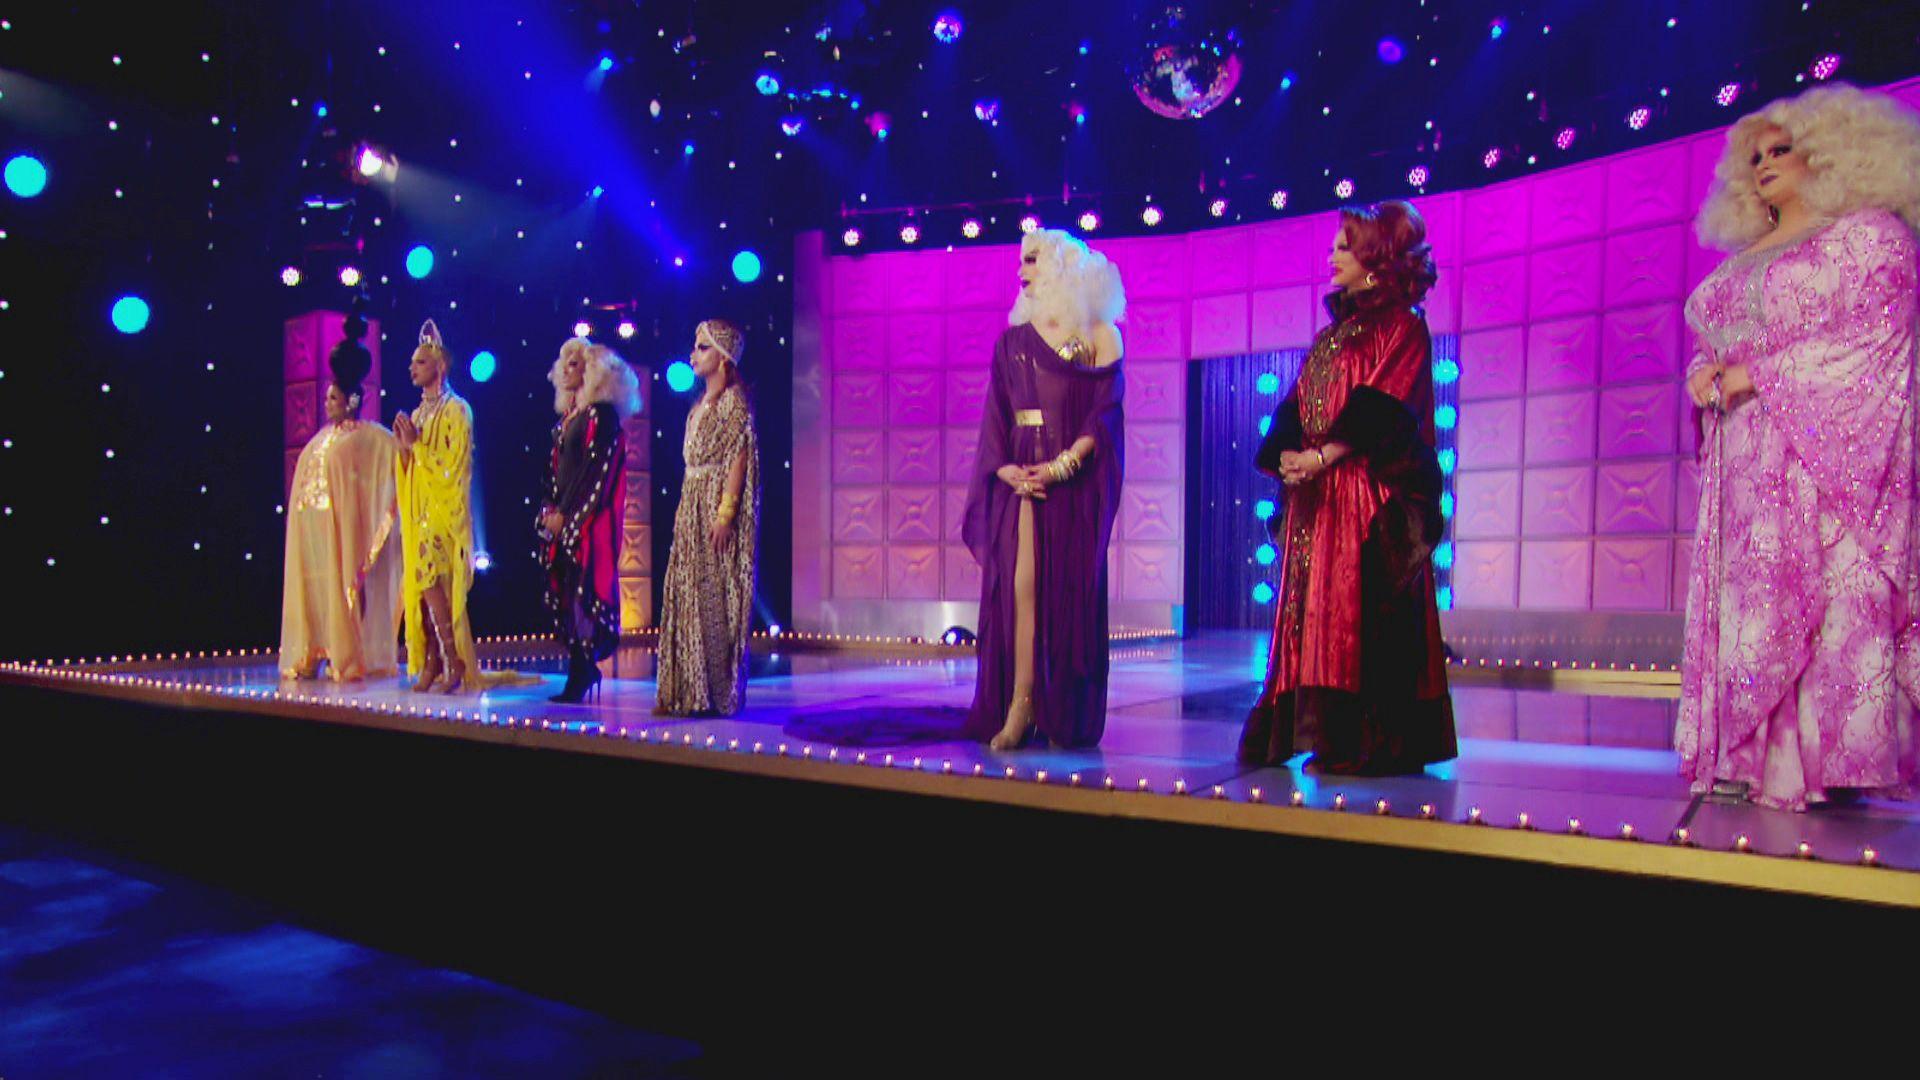 RuPaul's Drag Race - Dragracadabra | VH1